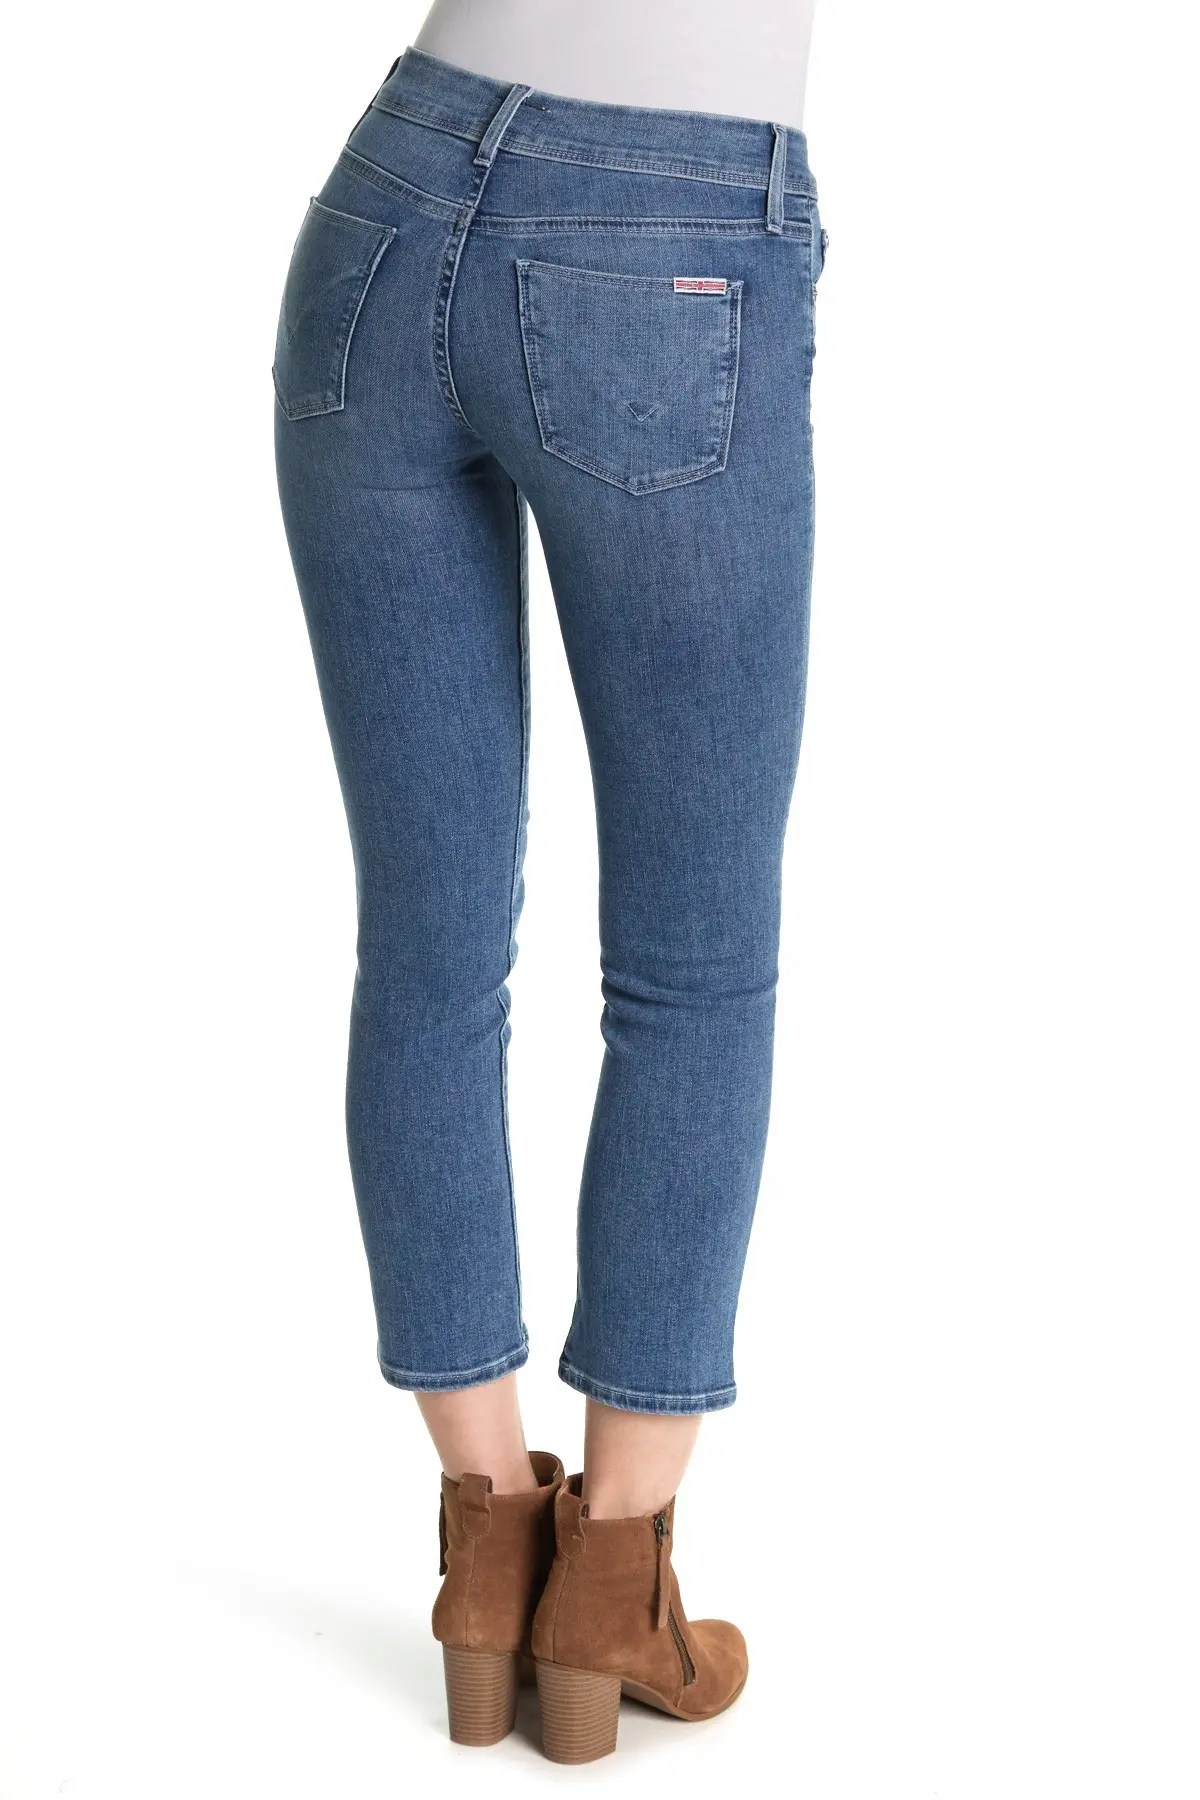 hudson jeans ginny cropped straight leg jeans nordstrom rack